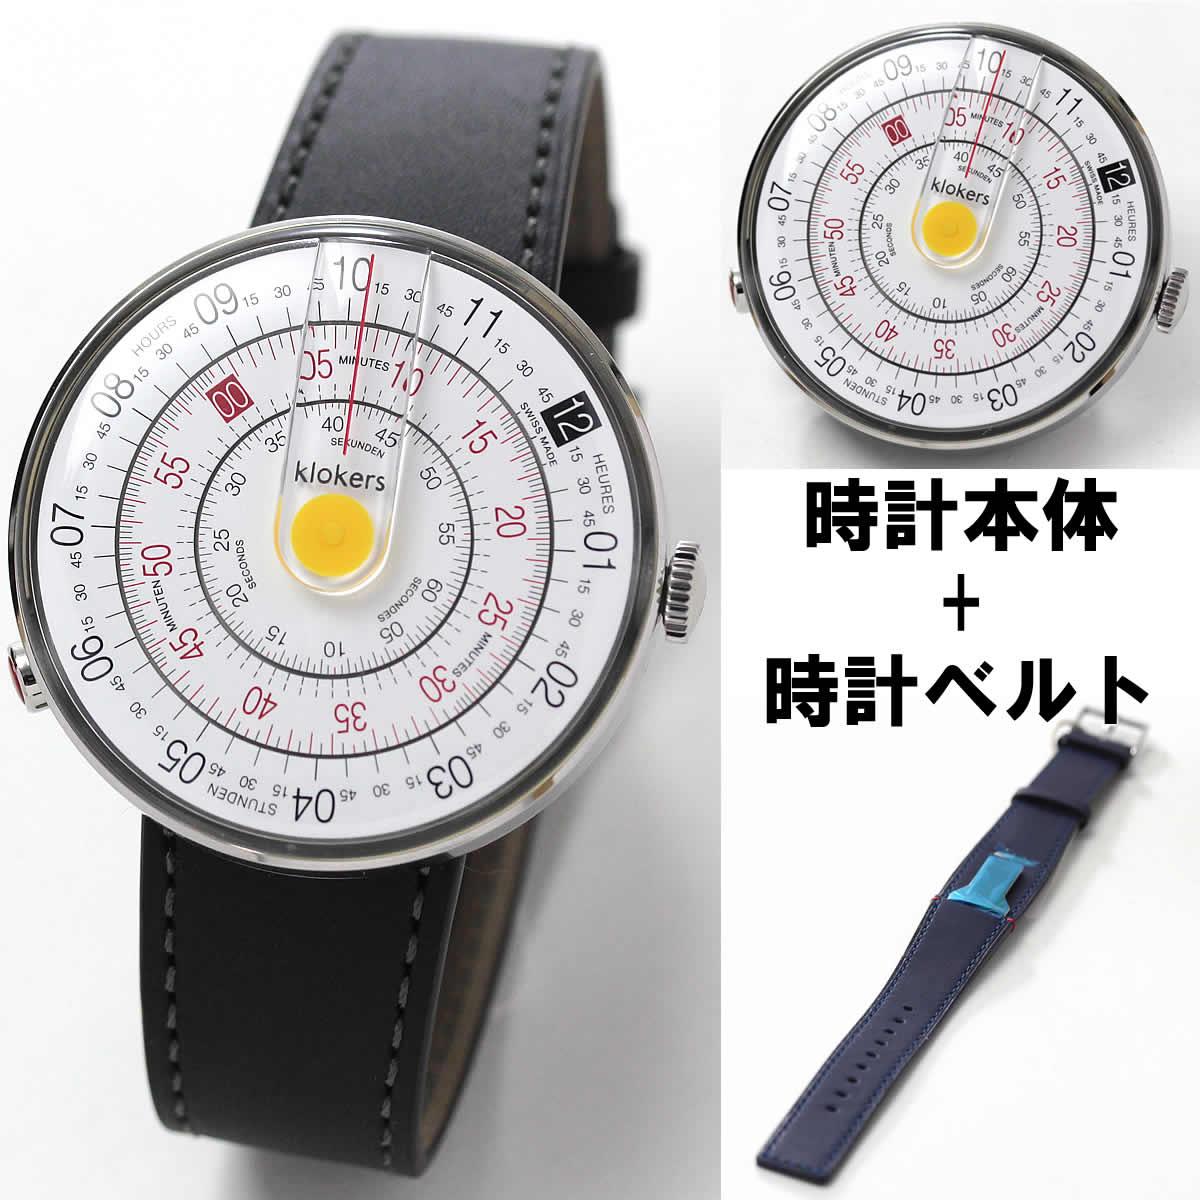 klokers(クロッカーズ) KLOK-01-D1 腕時計とklokers(クロッカーズ) 腕時計用ベルト マットブラックMC2セット